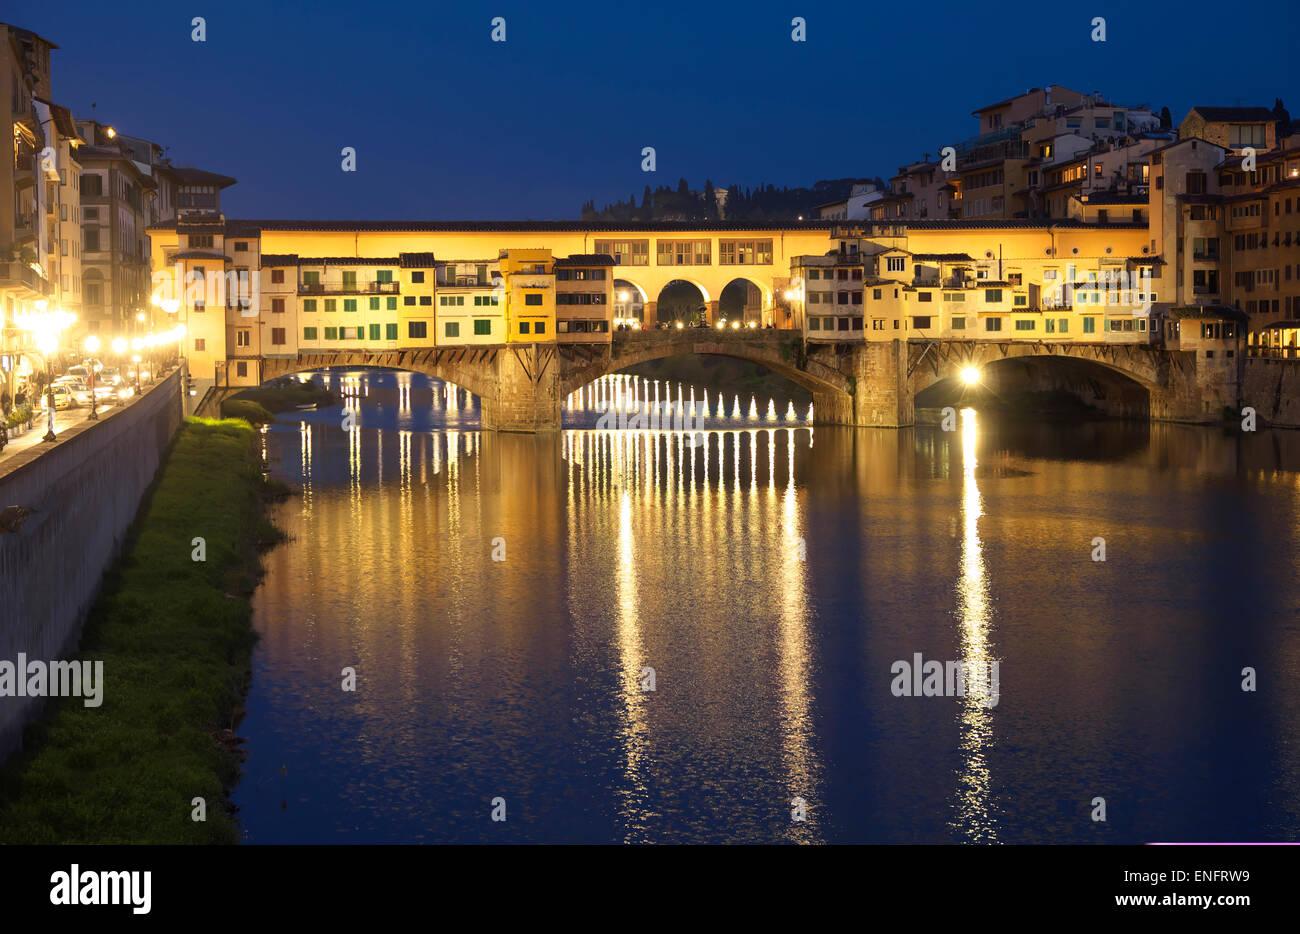 Ponte Vecchio, medieval bridge spanning the Arno River, UNESCO World Heritage Site, Florence, Tuscany, Italy - Stock Image